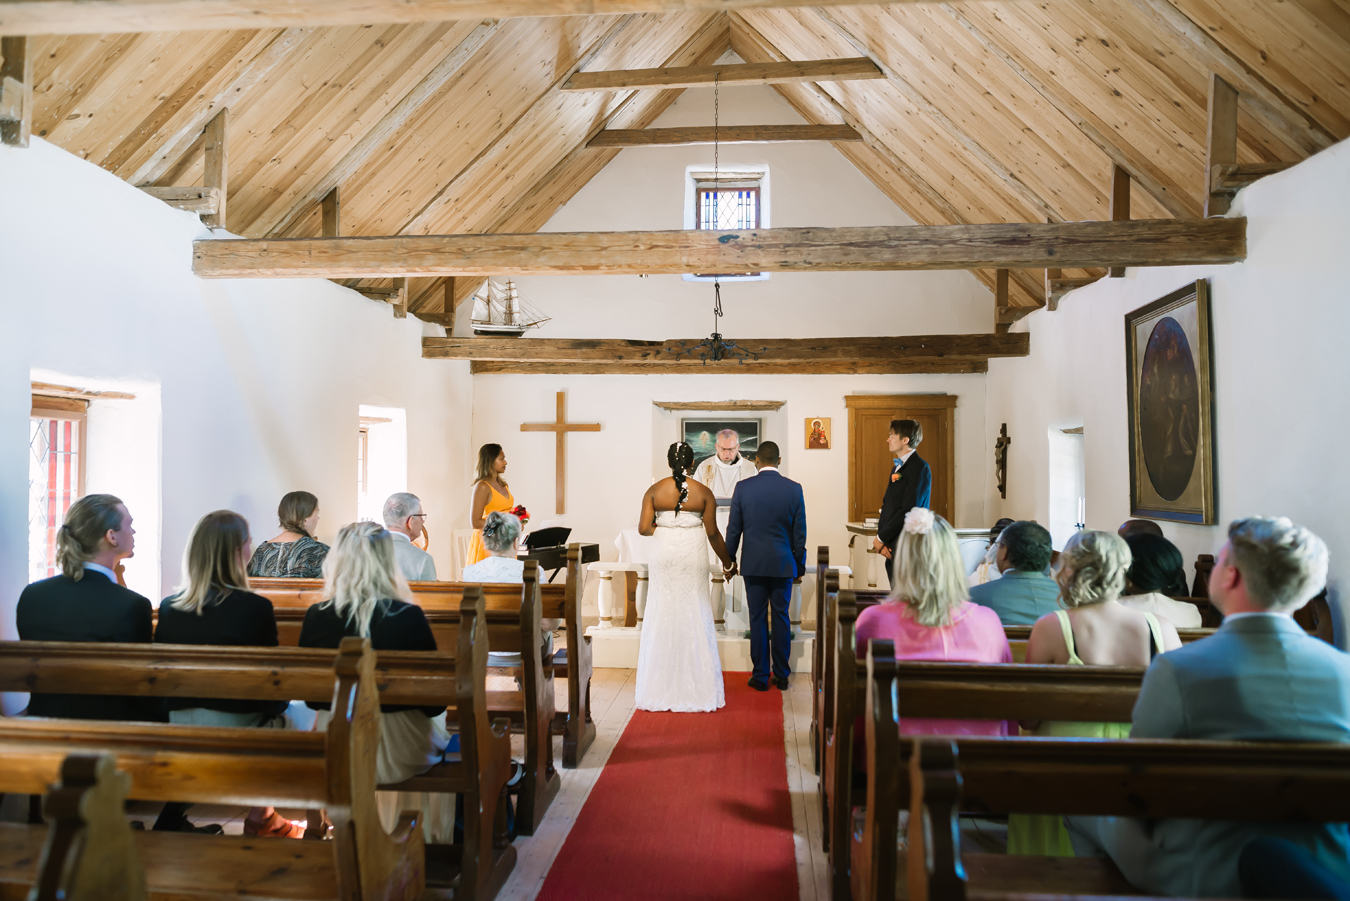 024-bröllop-gotland-fridhem-neas-fotografi.jpg